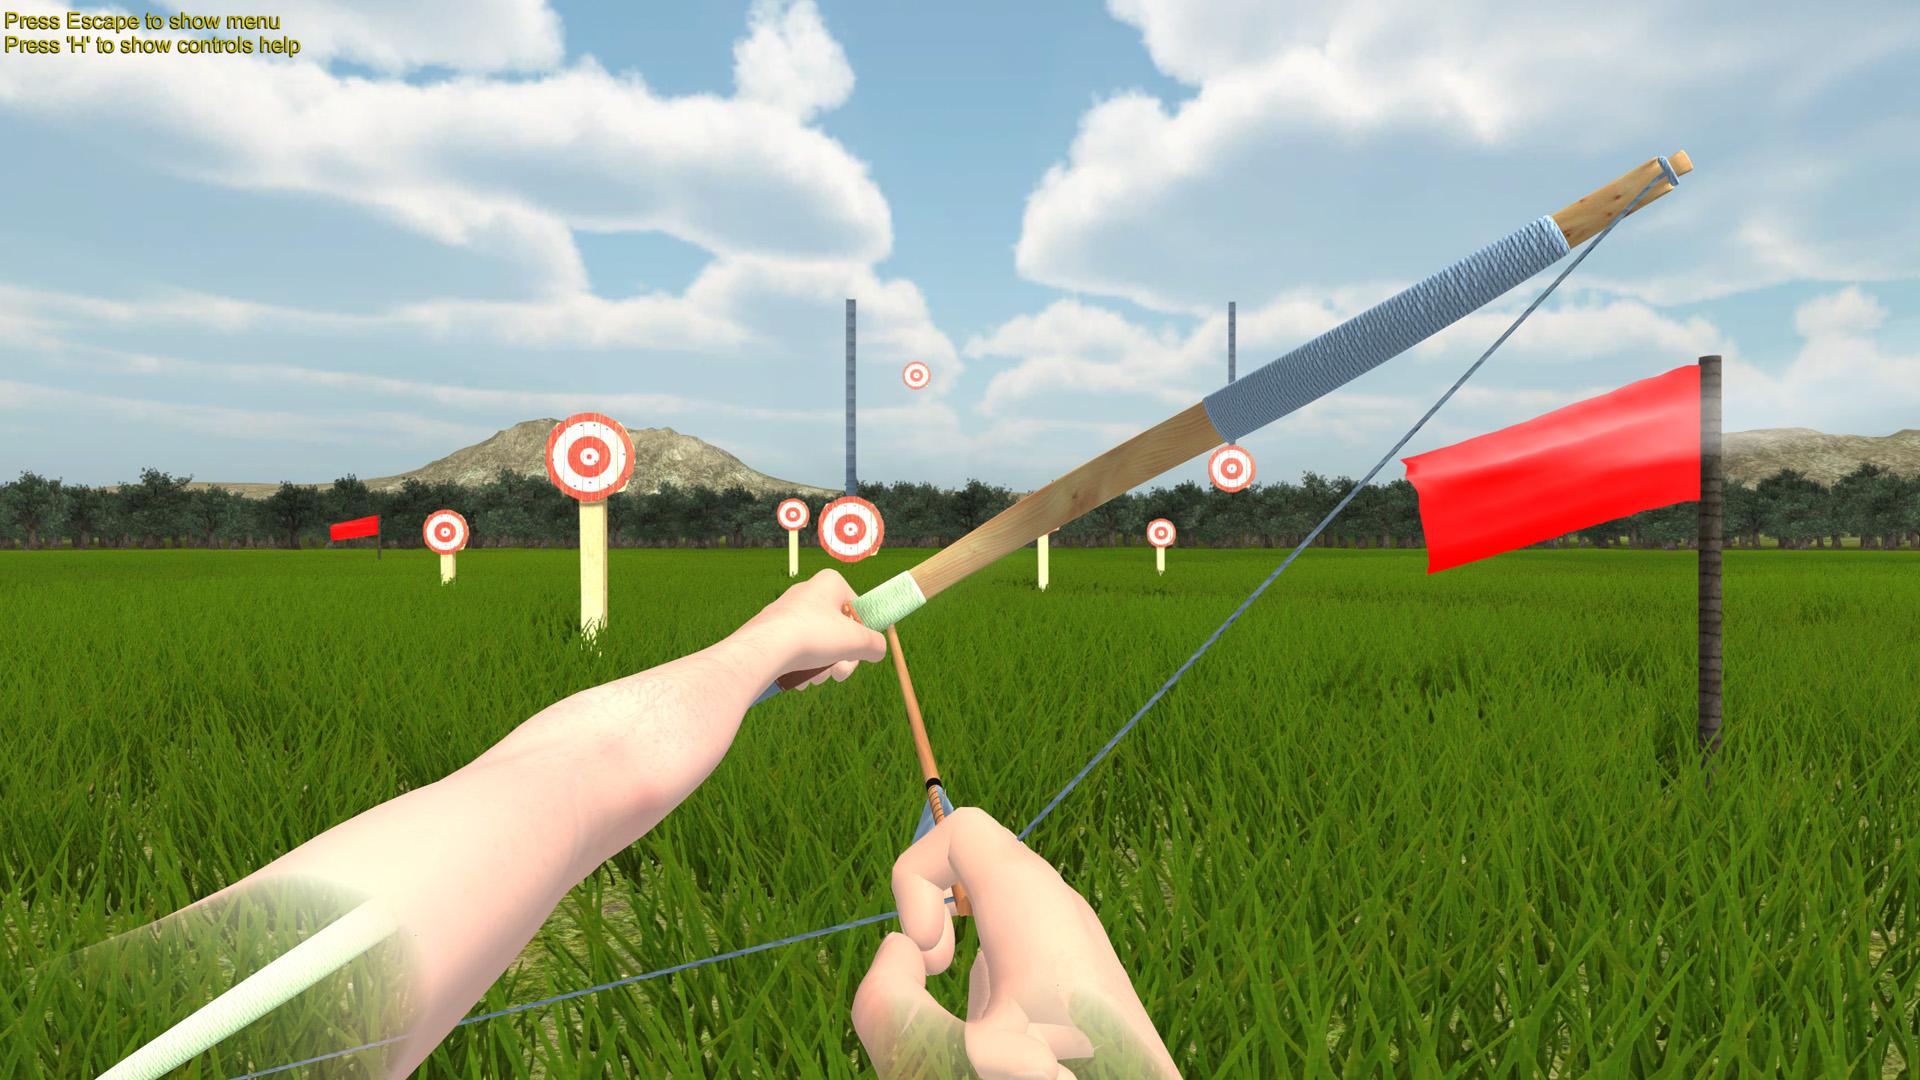 Probably Archery: A Brief 7DFPS Post-Mortem